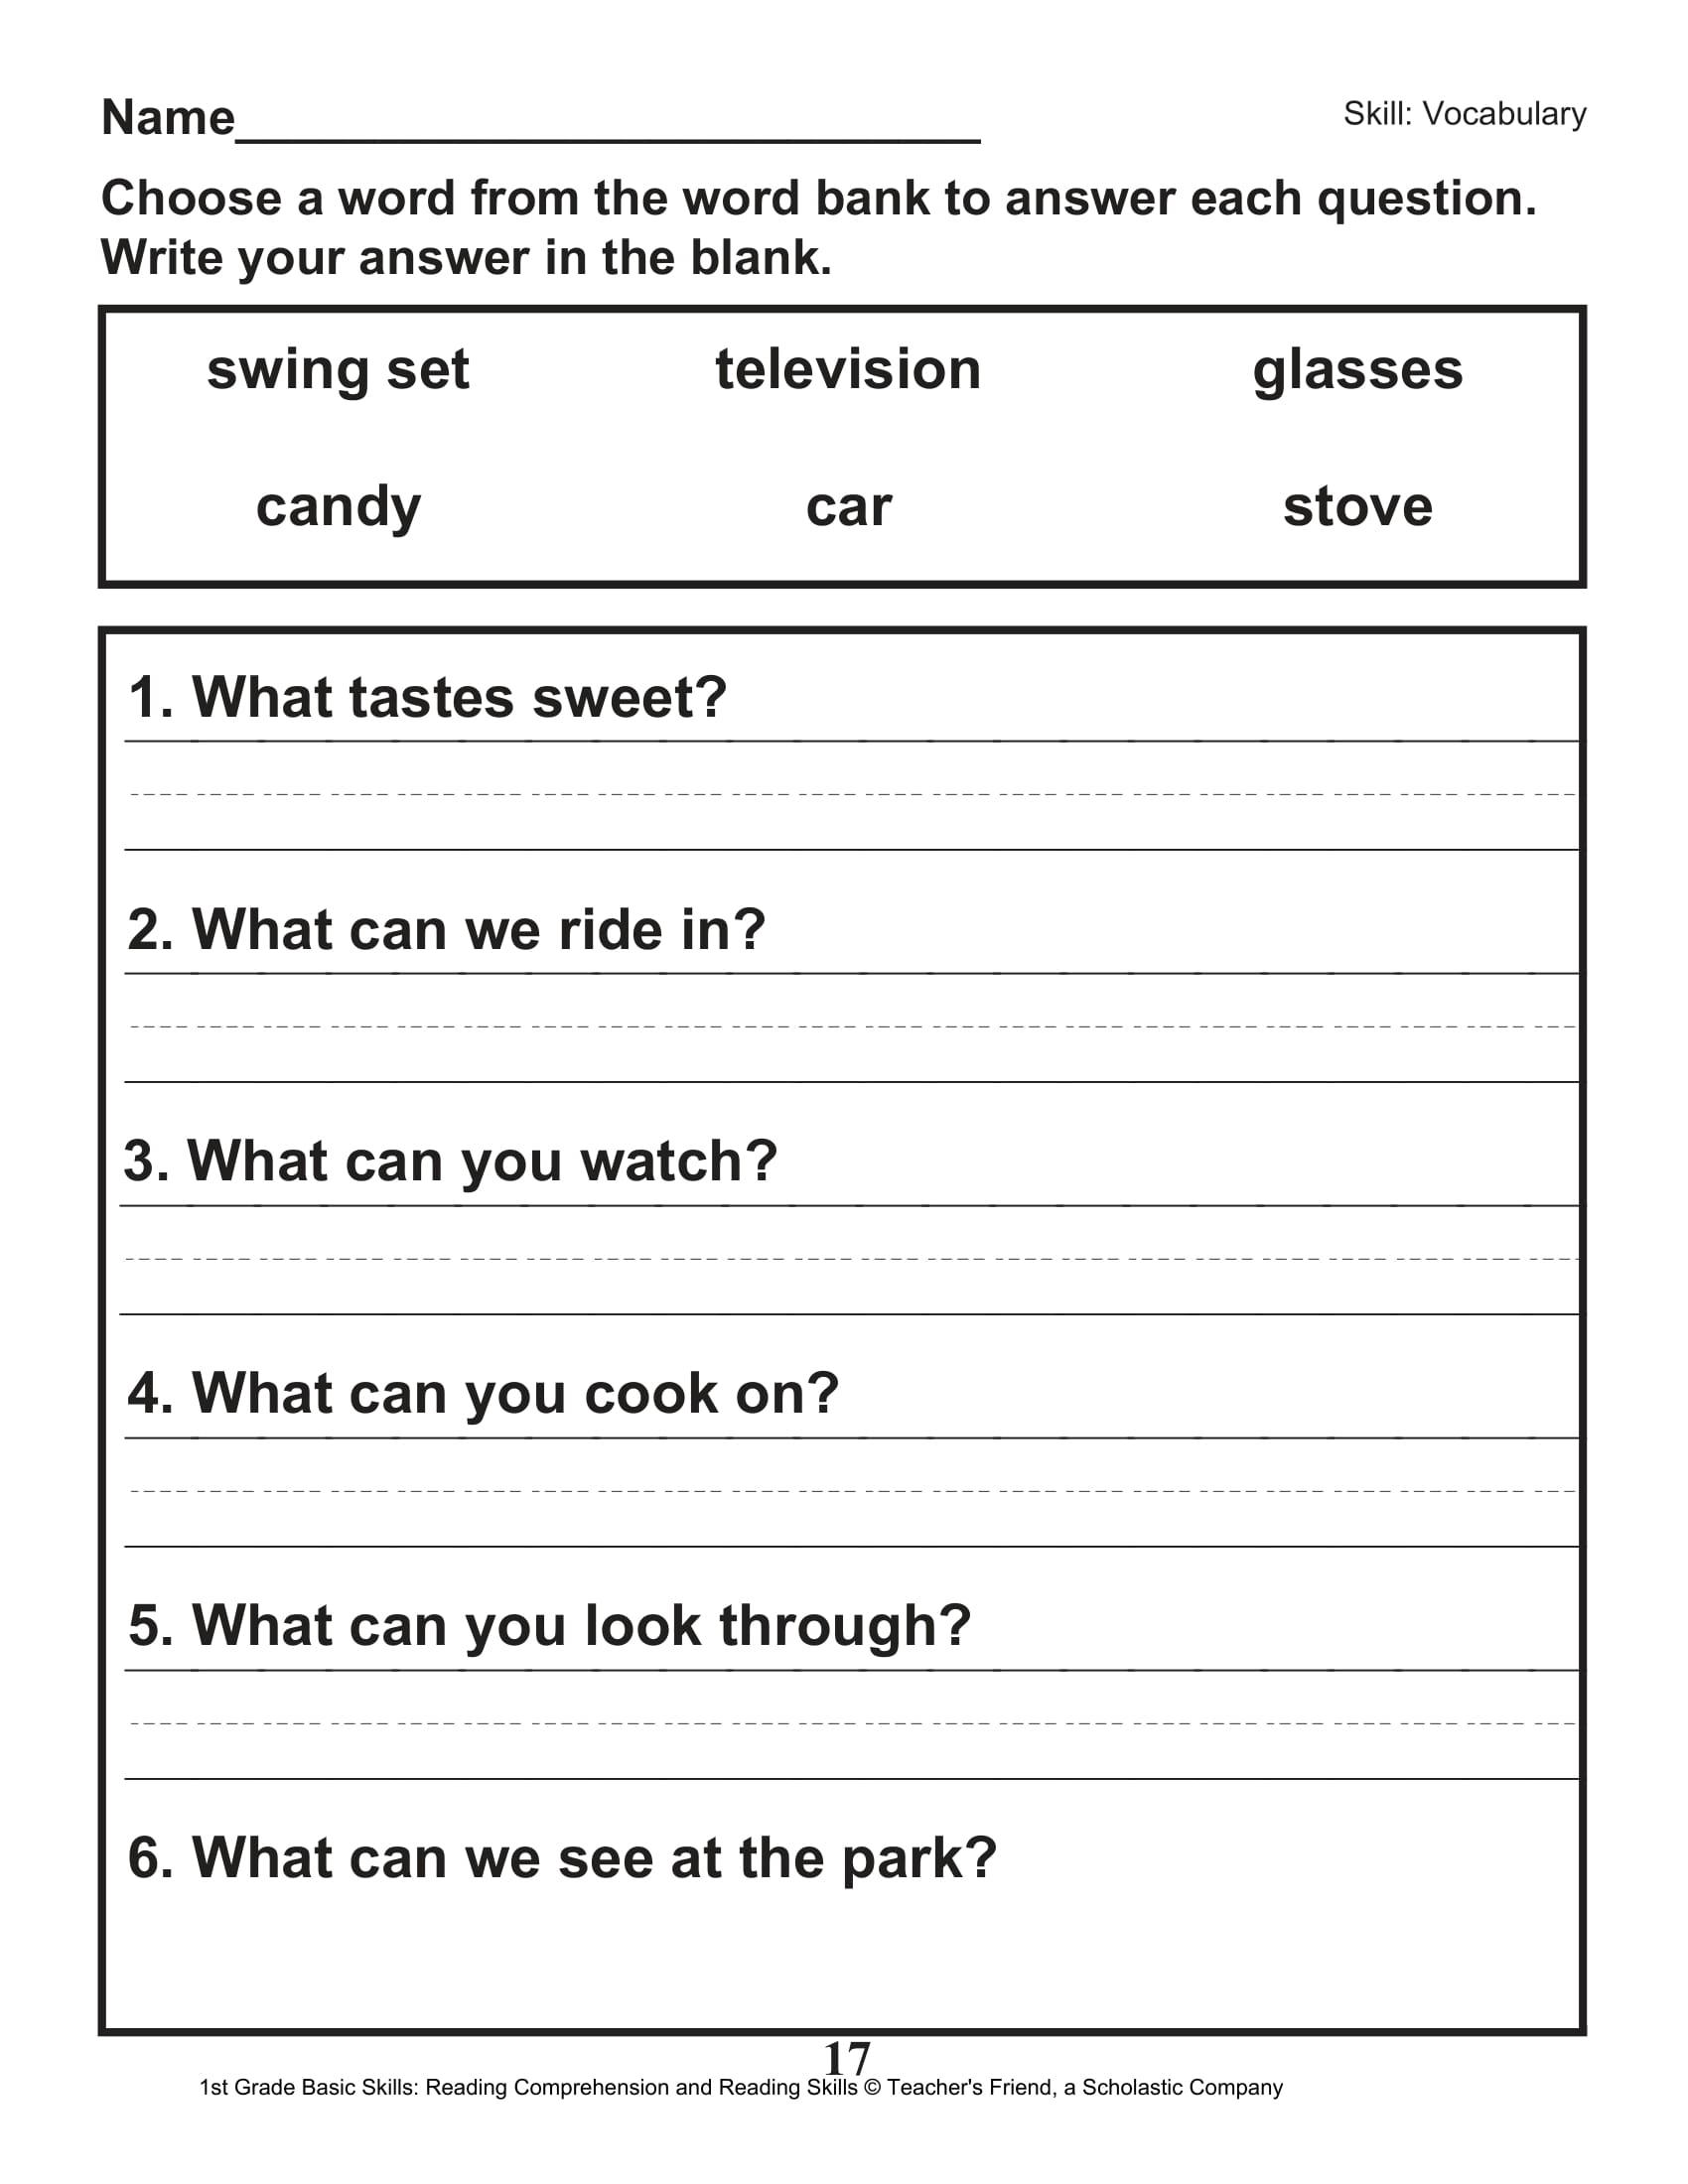 Scholastic 1st Grade Reading Comprehension Skills Worksheets 18